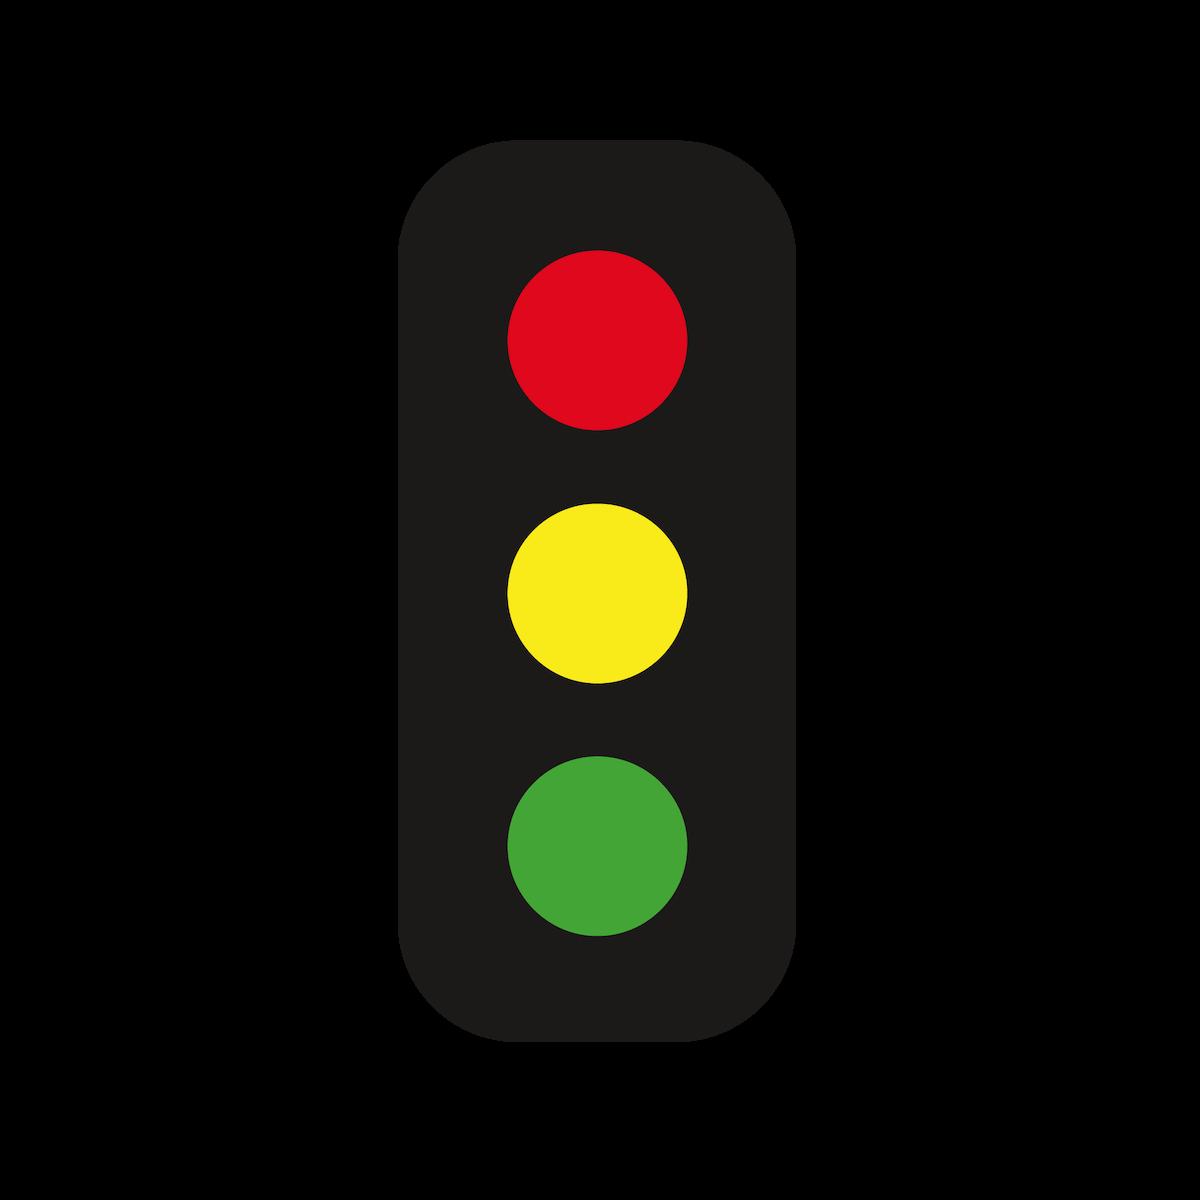 Playground Marking Traffic Lights